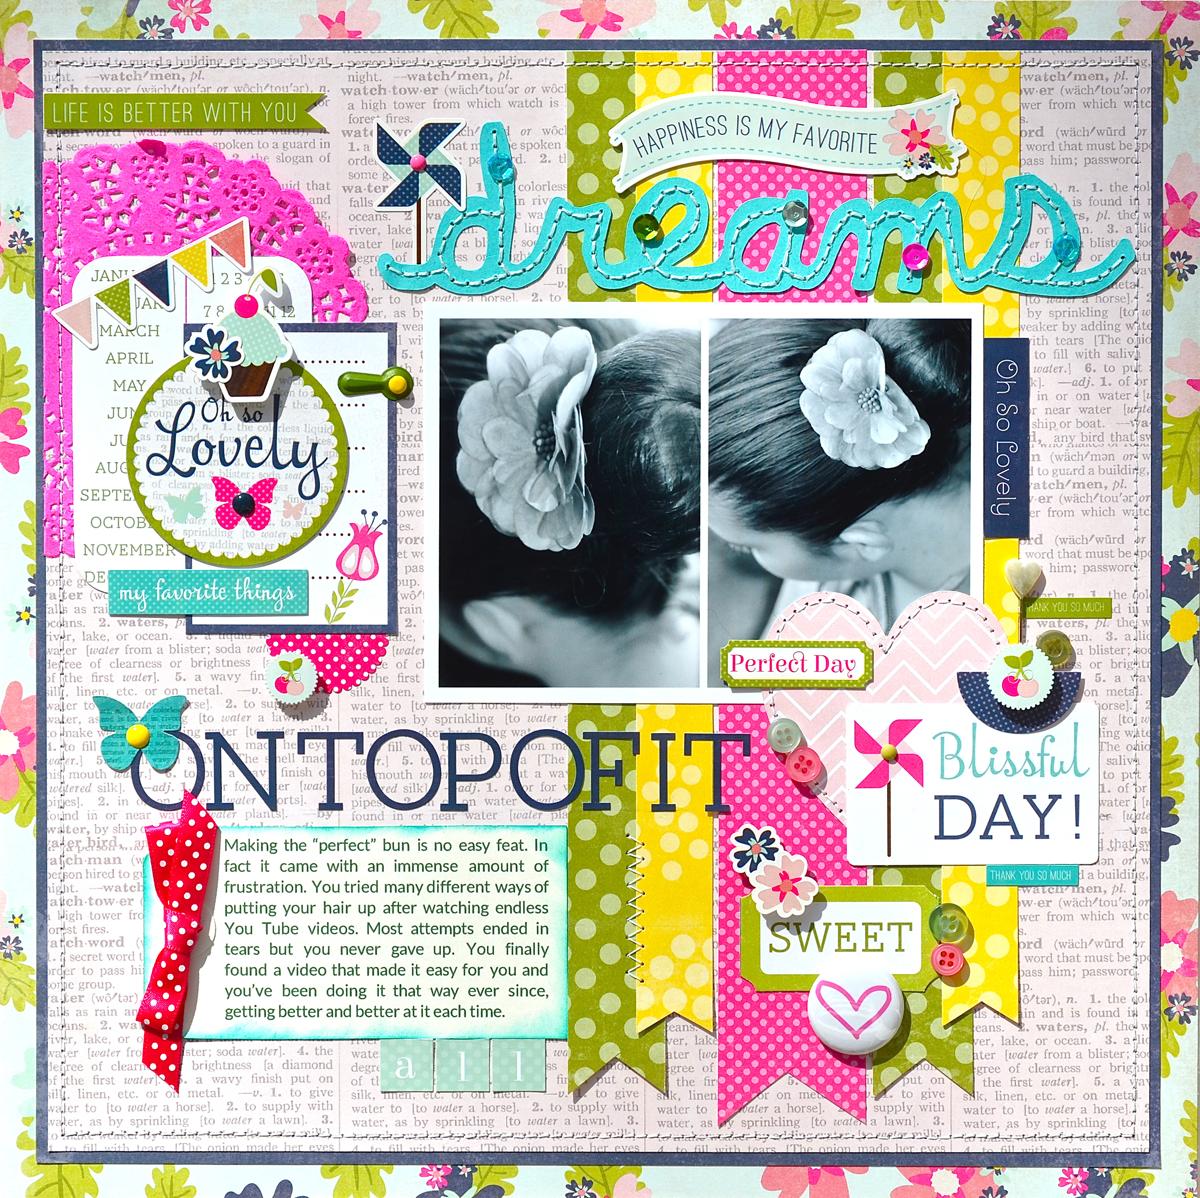 How to scrapbook magazines - On Top Of It All Echo Park Splendid Sunshine